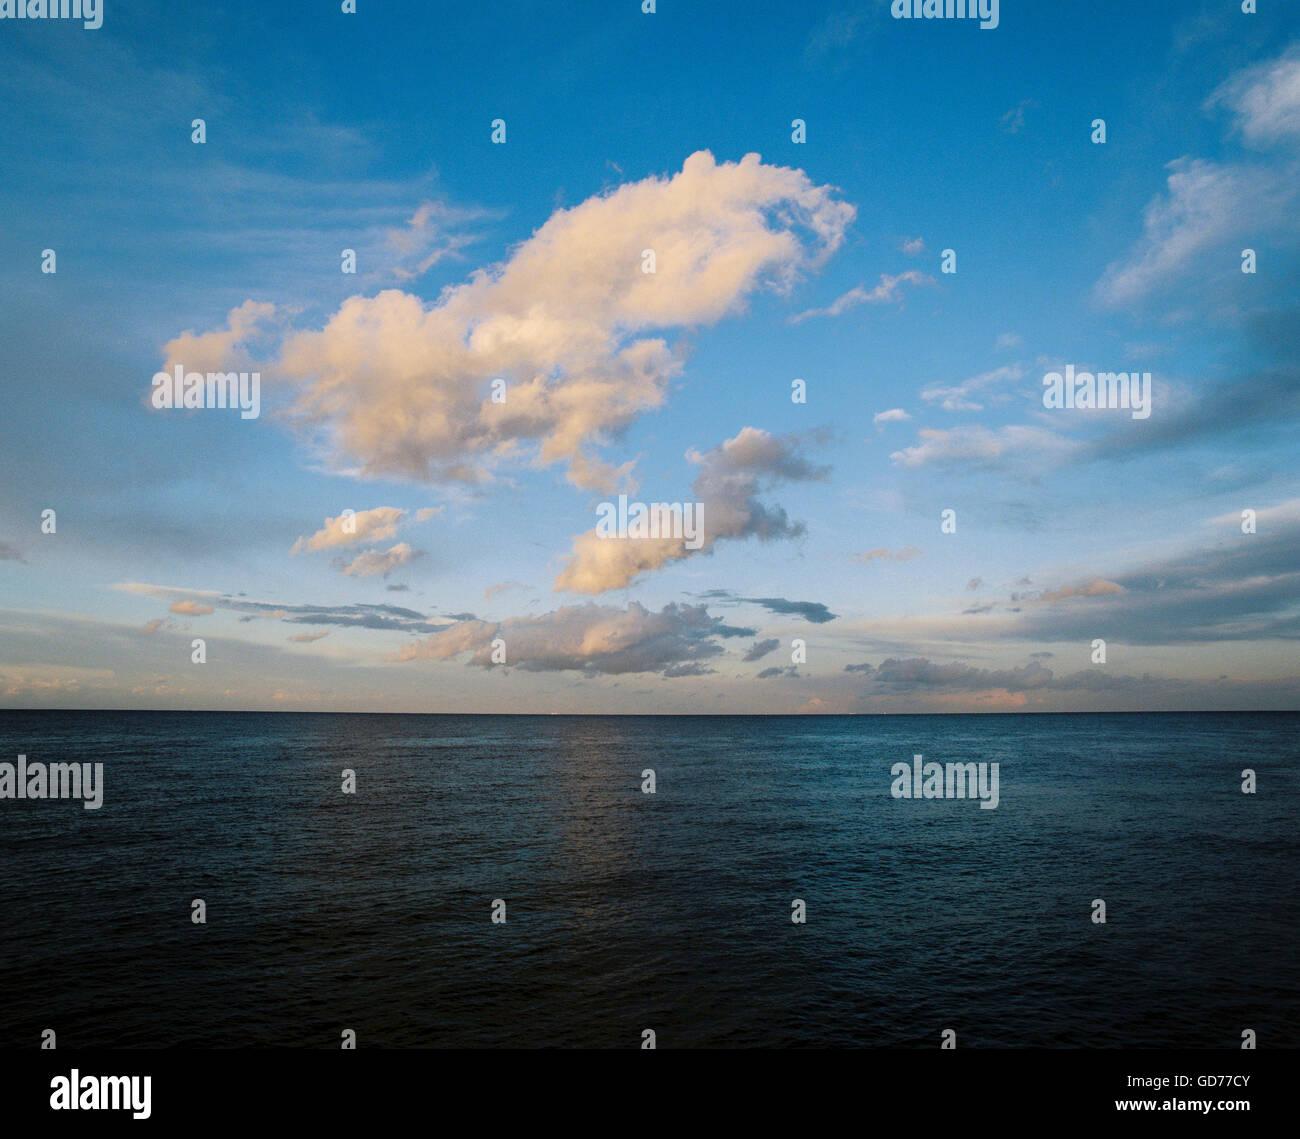 Clouds at sunset, Deal, kent. - Stock Image